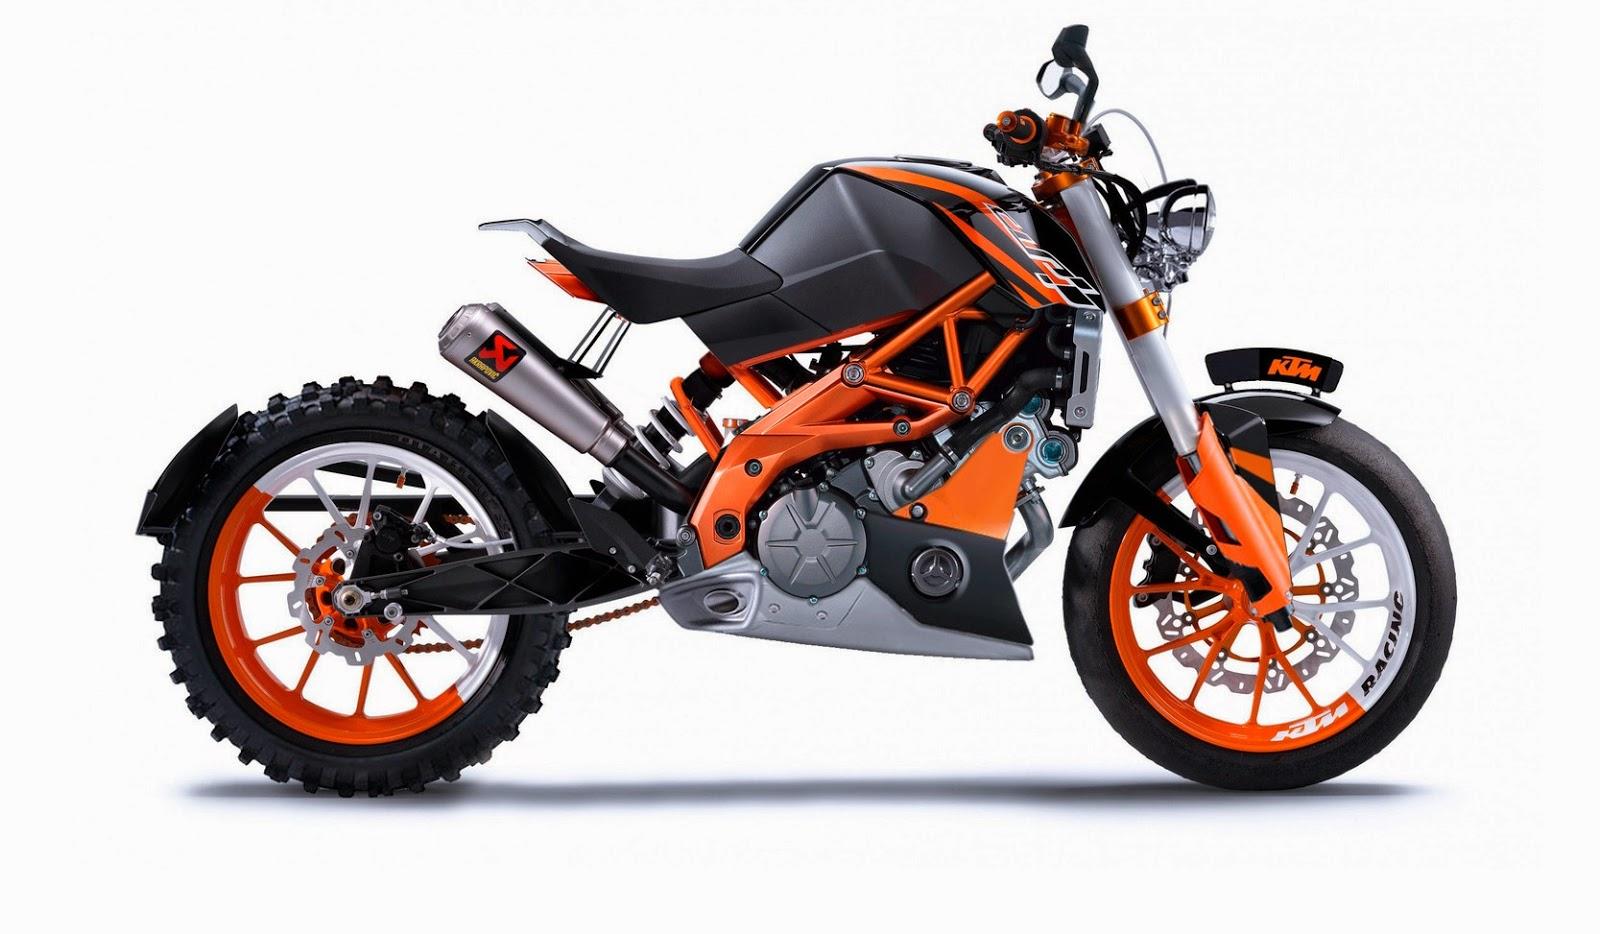 Bike Cars HD Wallpapers KTM 125 Duke PP Motorcycles HD 1600x934